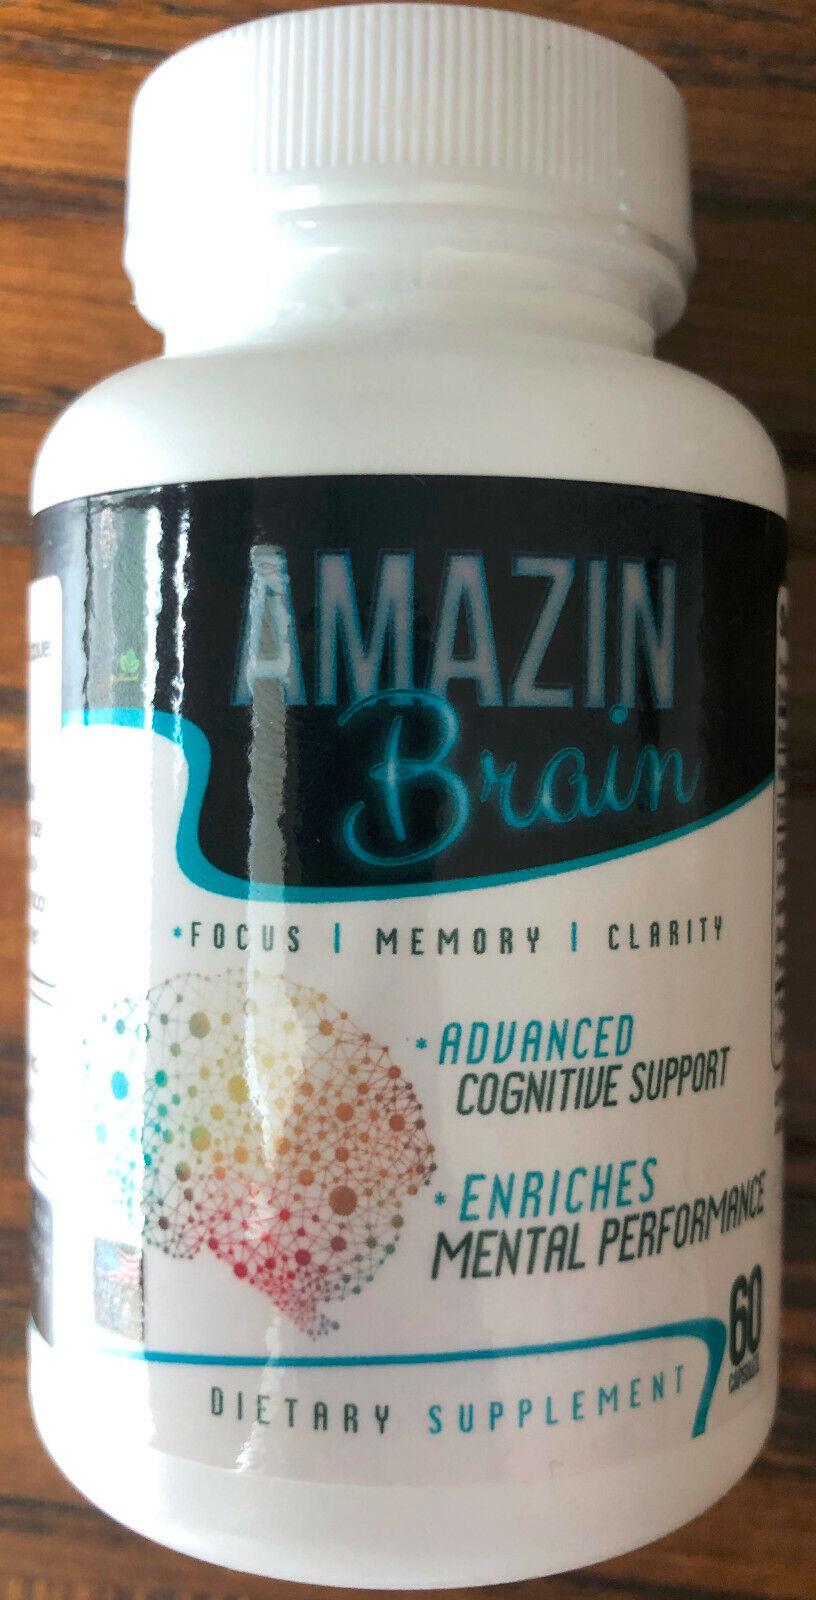 AMAZIN BRAIN - FOCUS, MEMORY, CLARITY - ADVANCED COGNITIVE SUPPORT